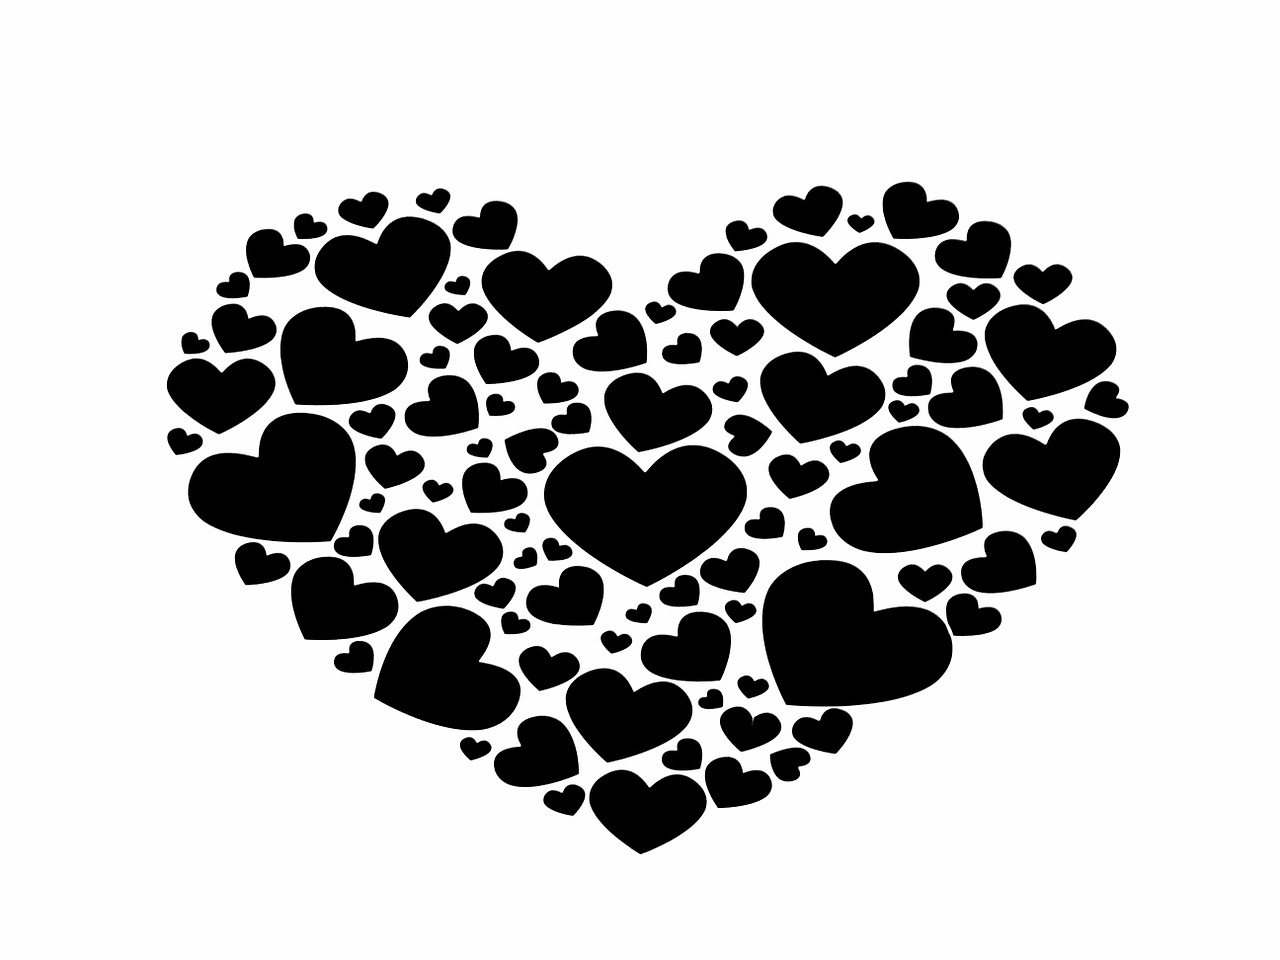 heart-1104707_1280